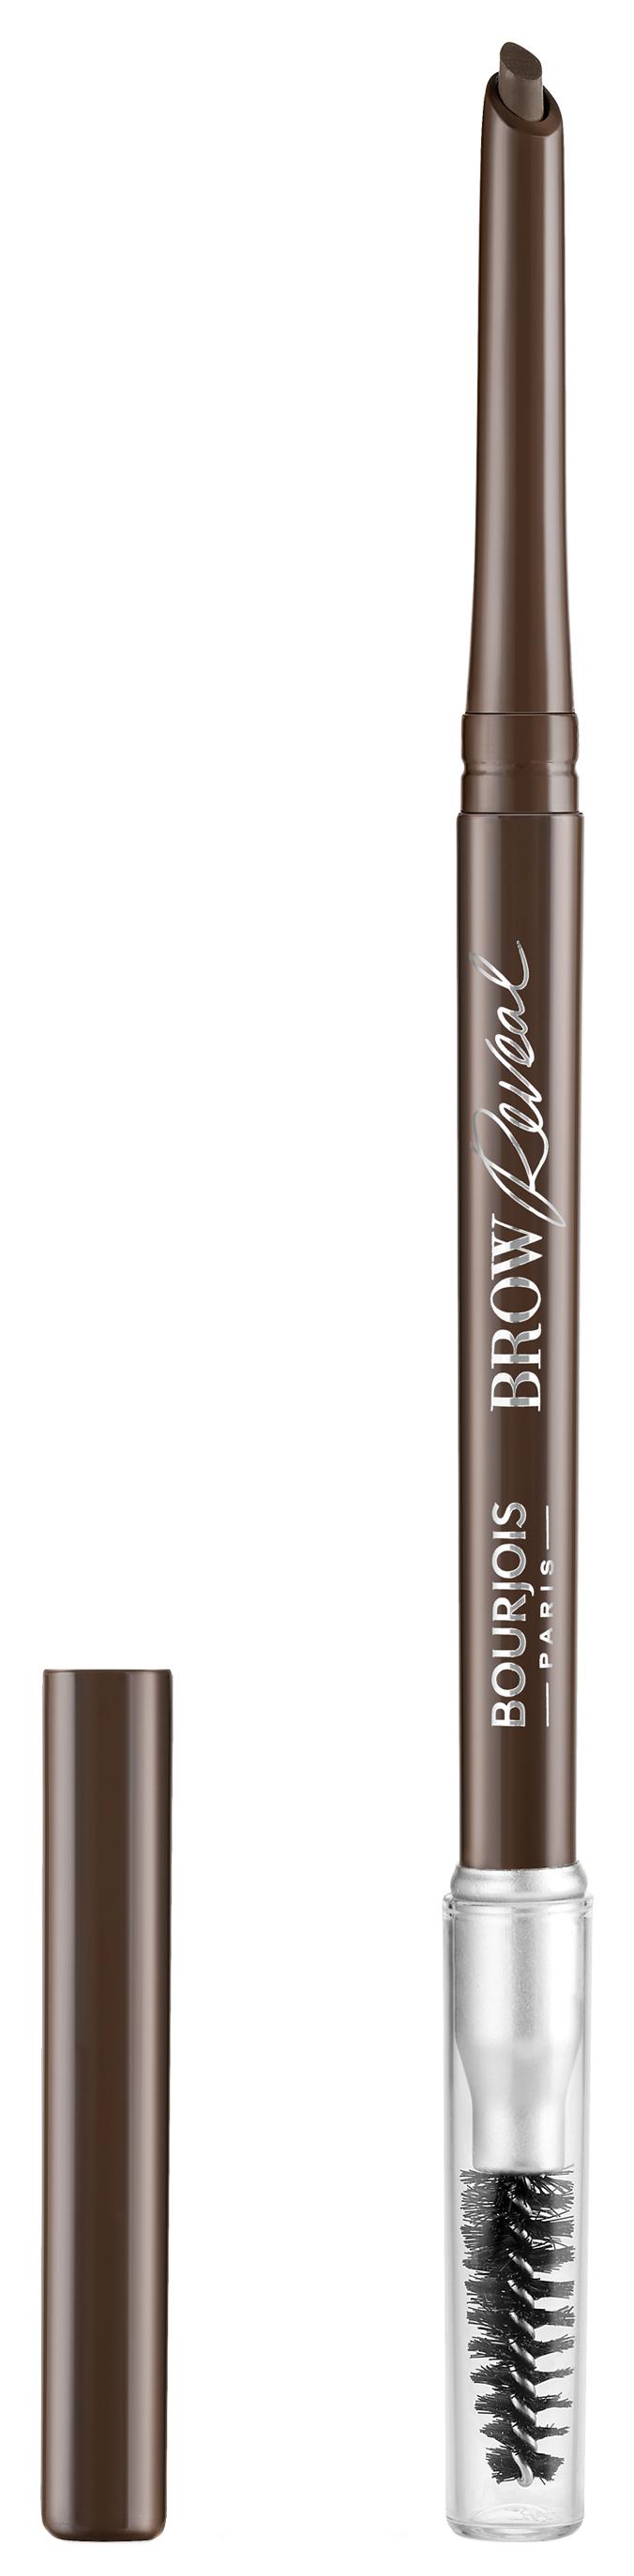 Карандаш для бровей Bourjois Brow Reveal 03 Brown 0,35 г